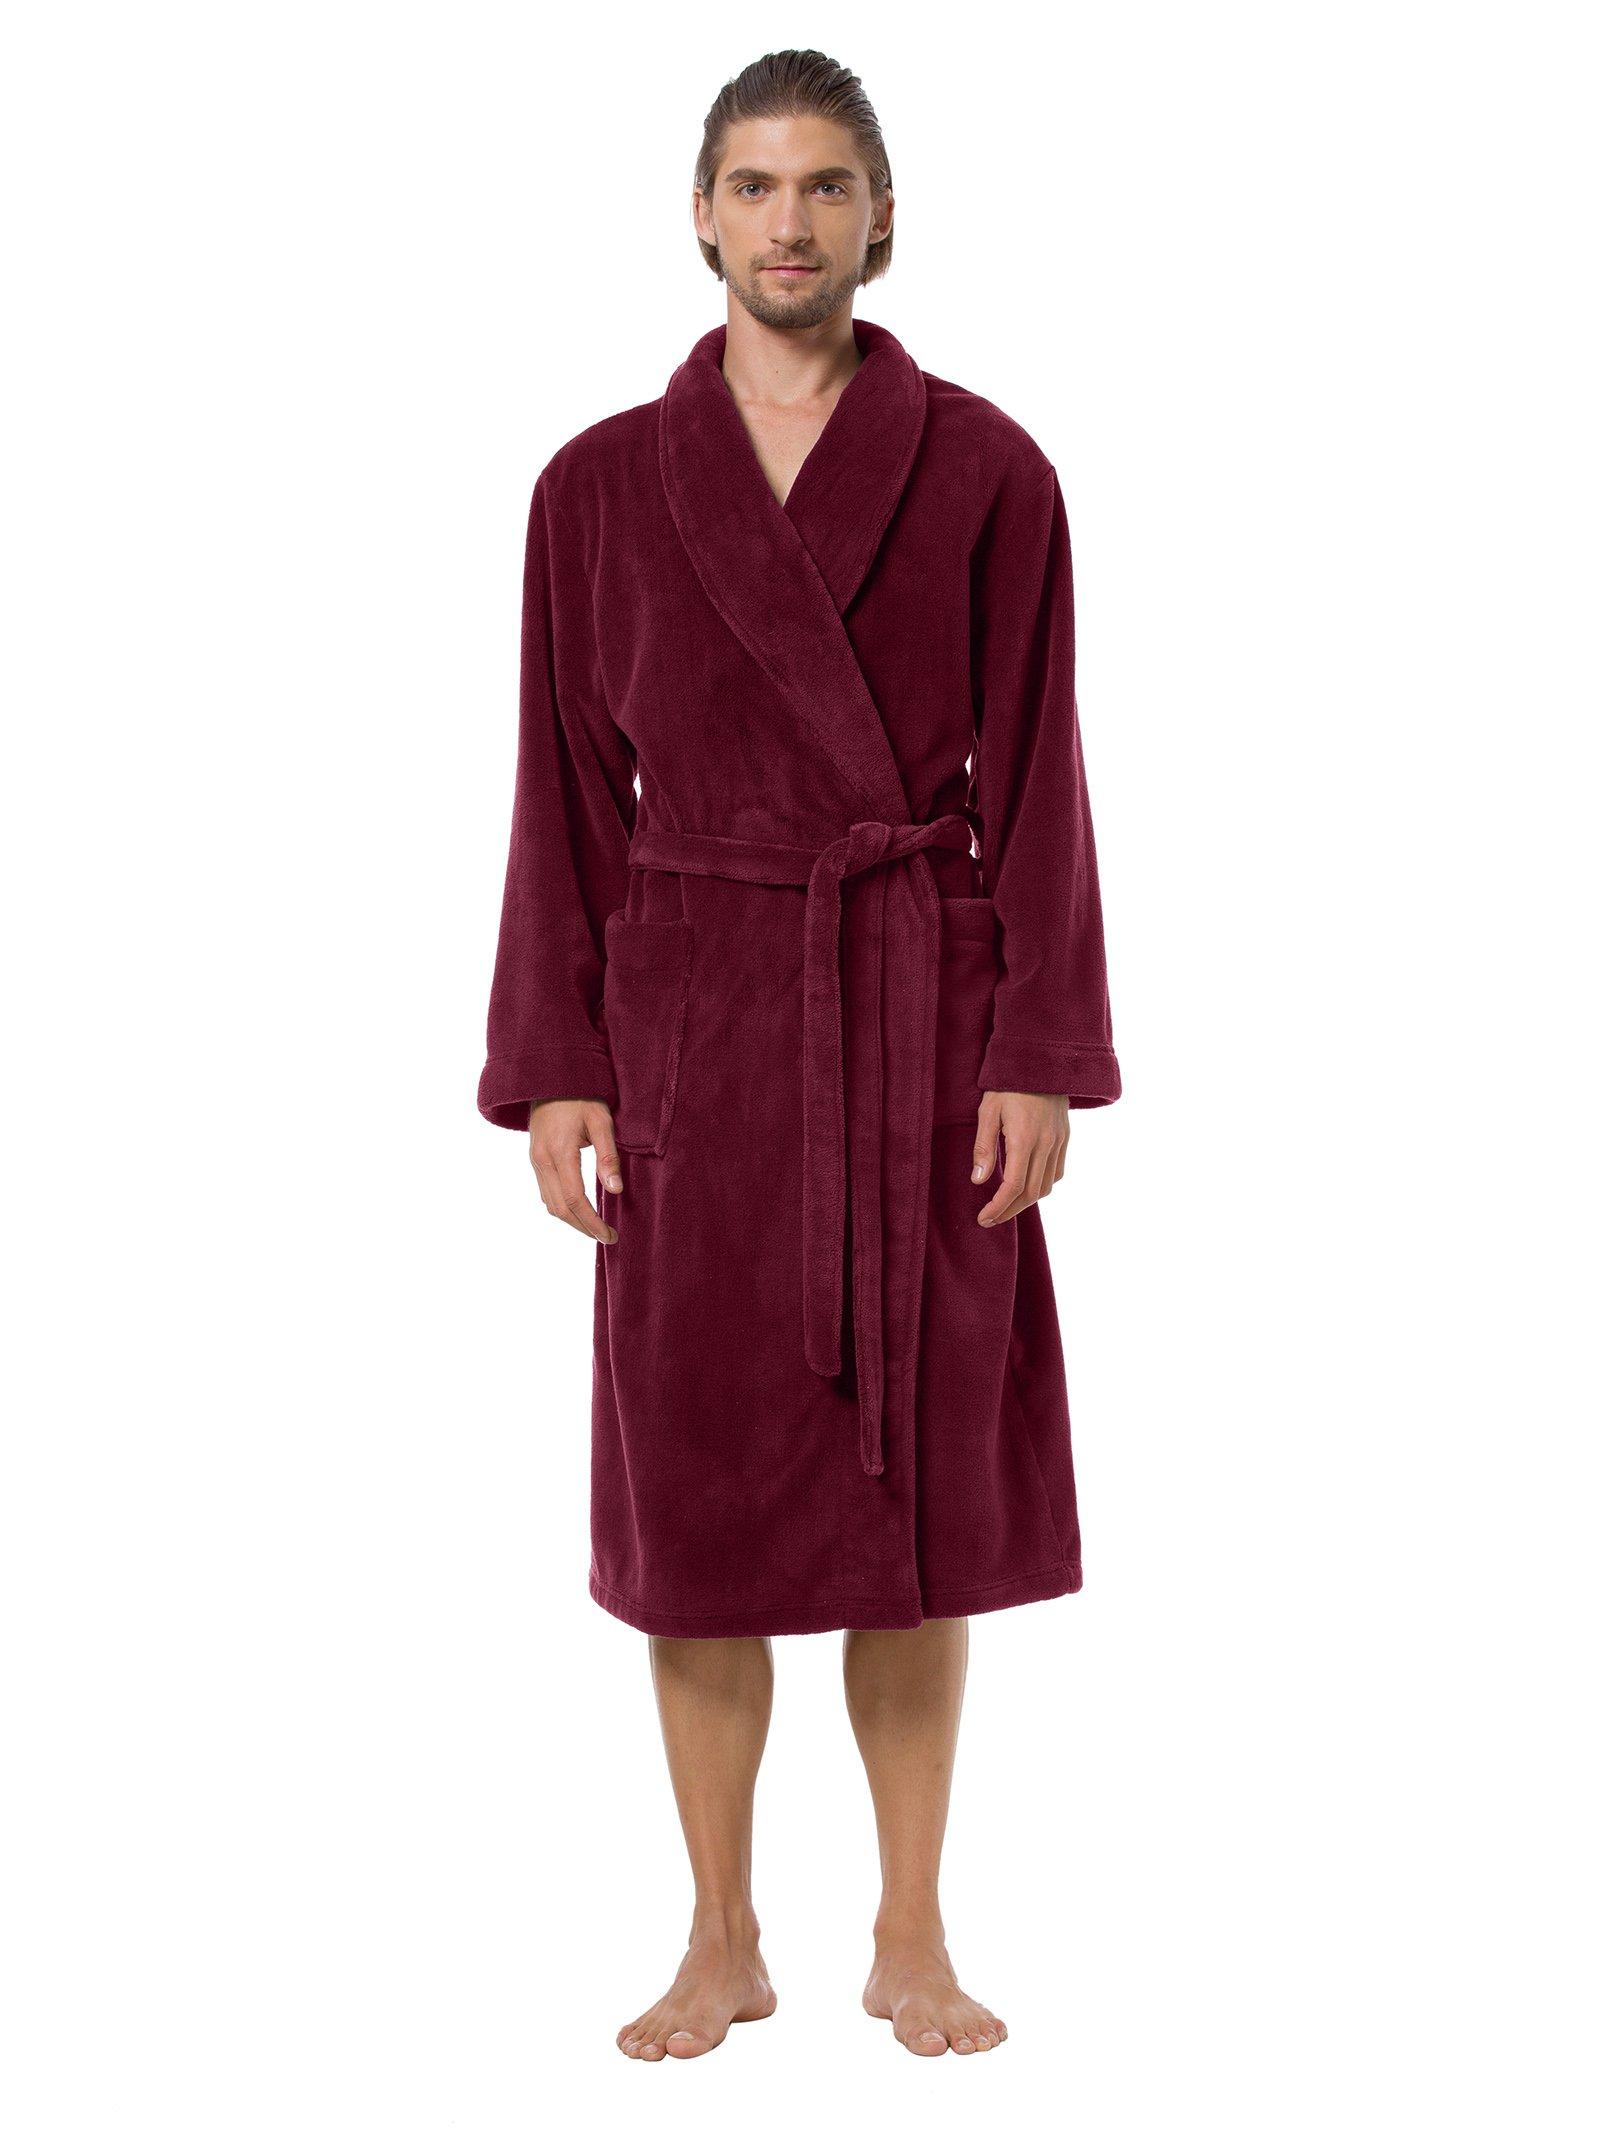 SIORO Long Lightweight Robe Men's Sleepwear 2XL Long Plush Soft Bathrobe Winter Warm Nightgown Absorbent Burgundy